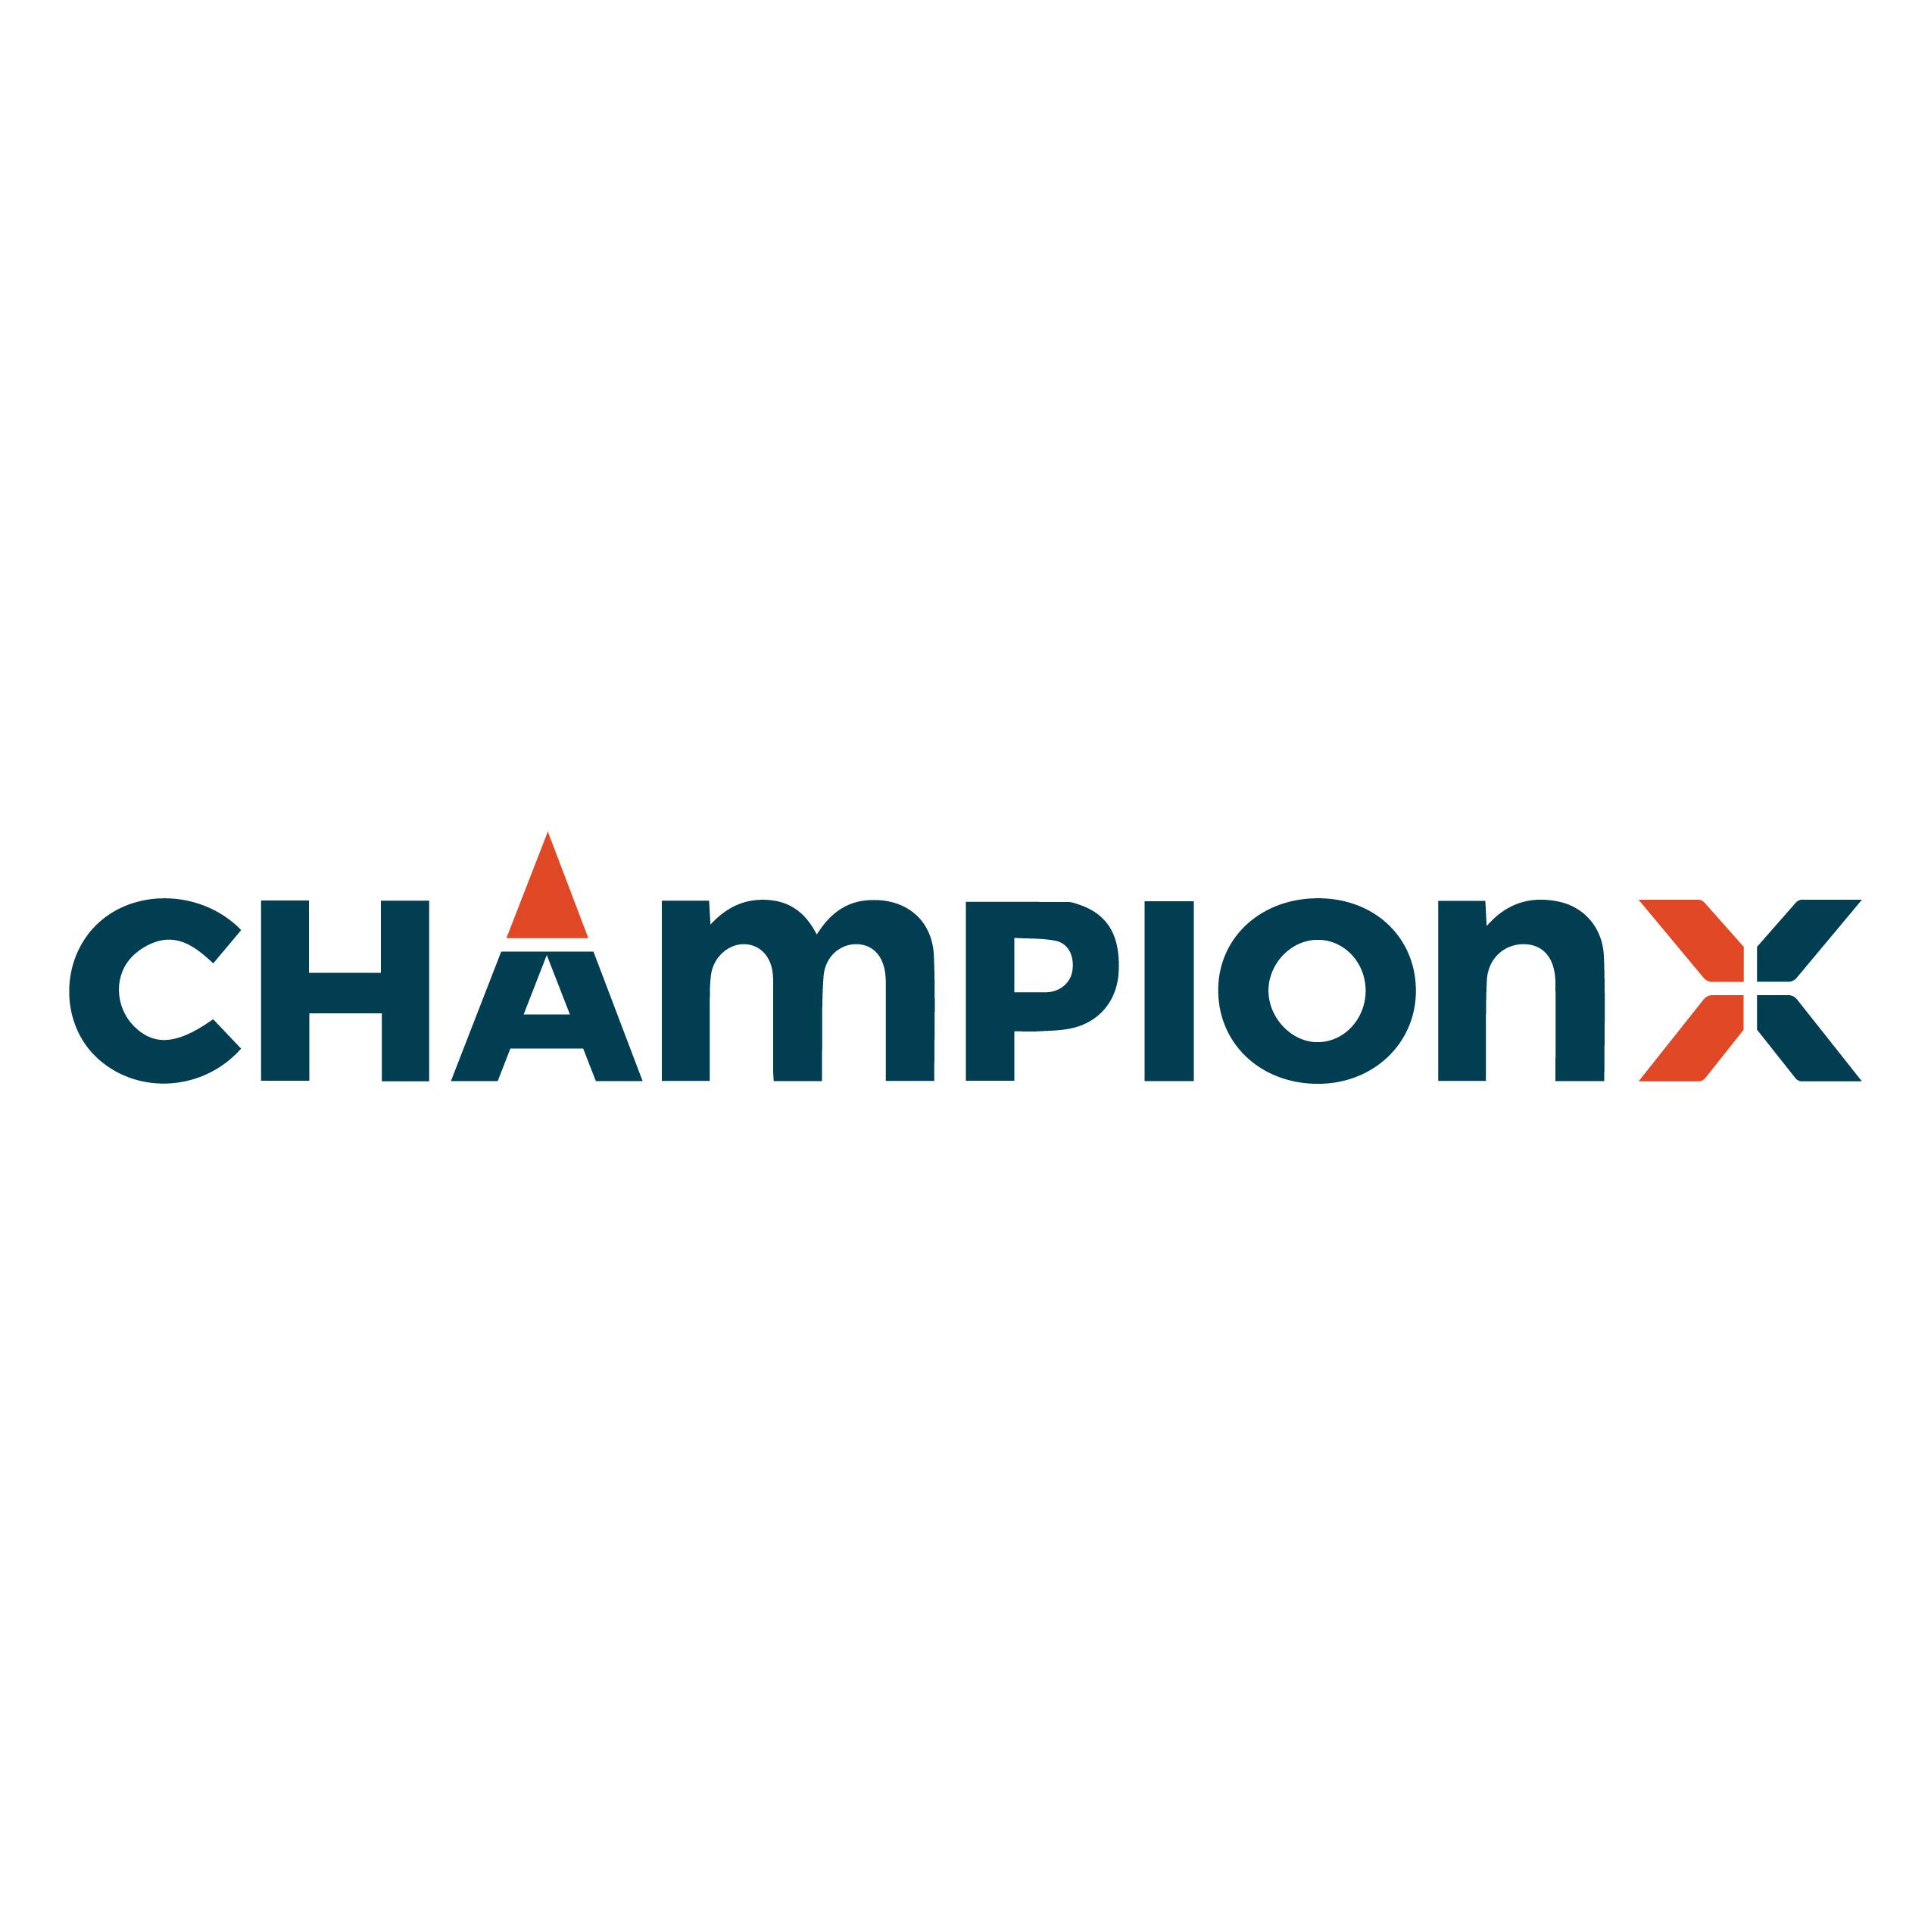 ChampionX